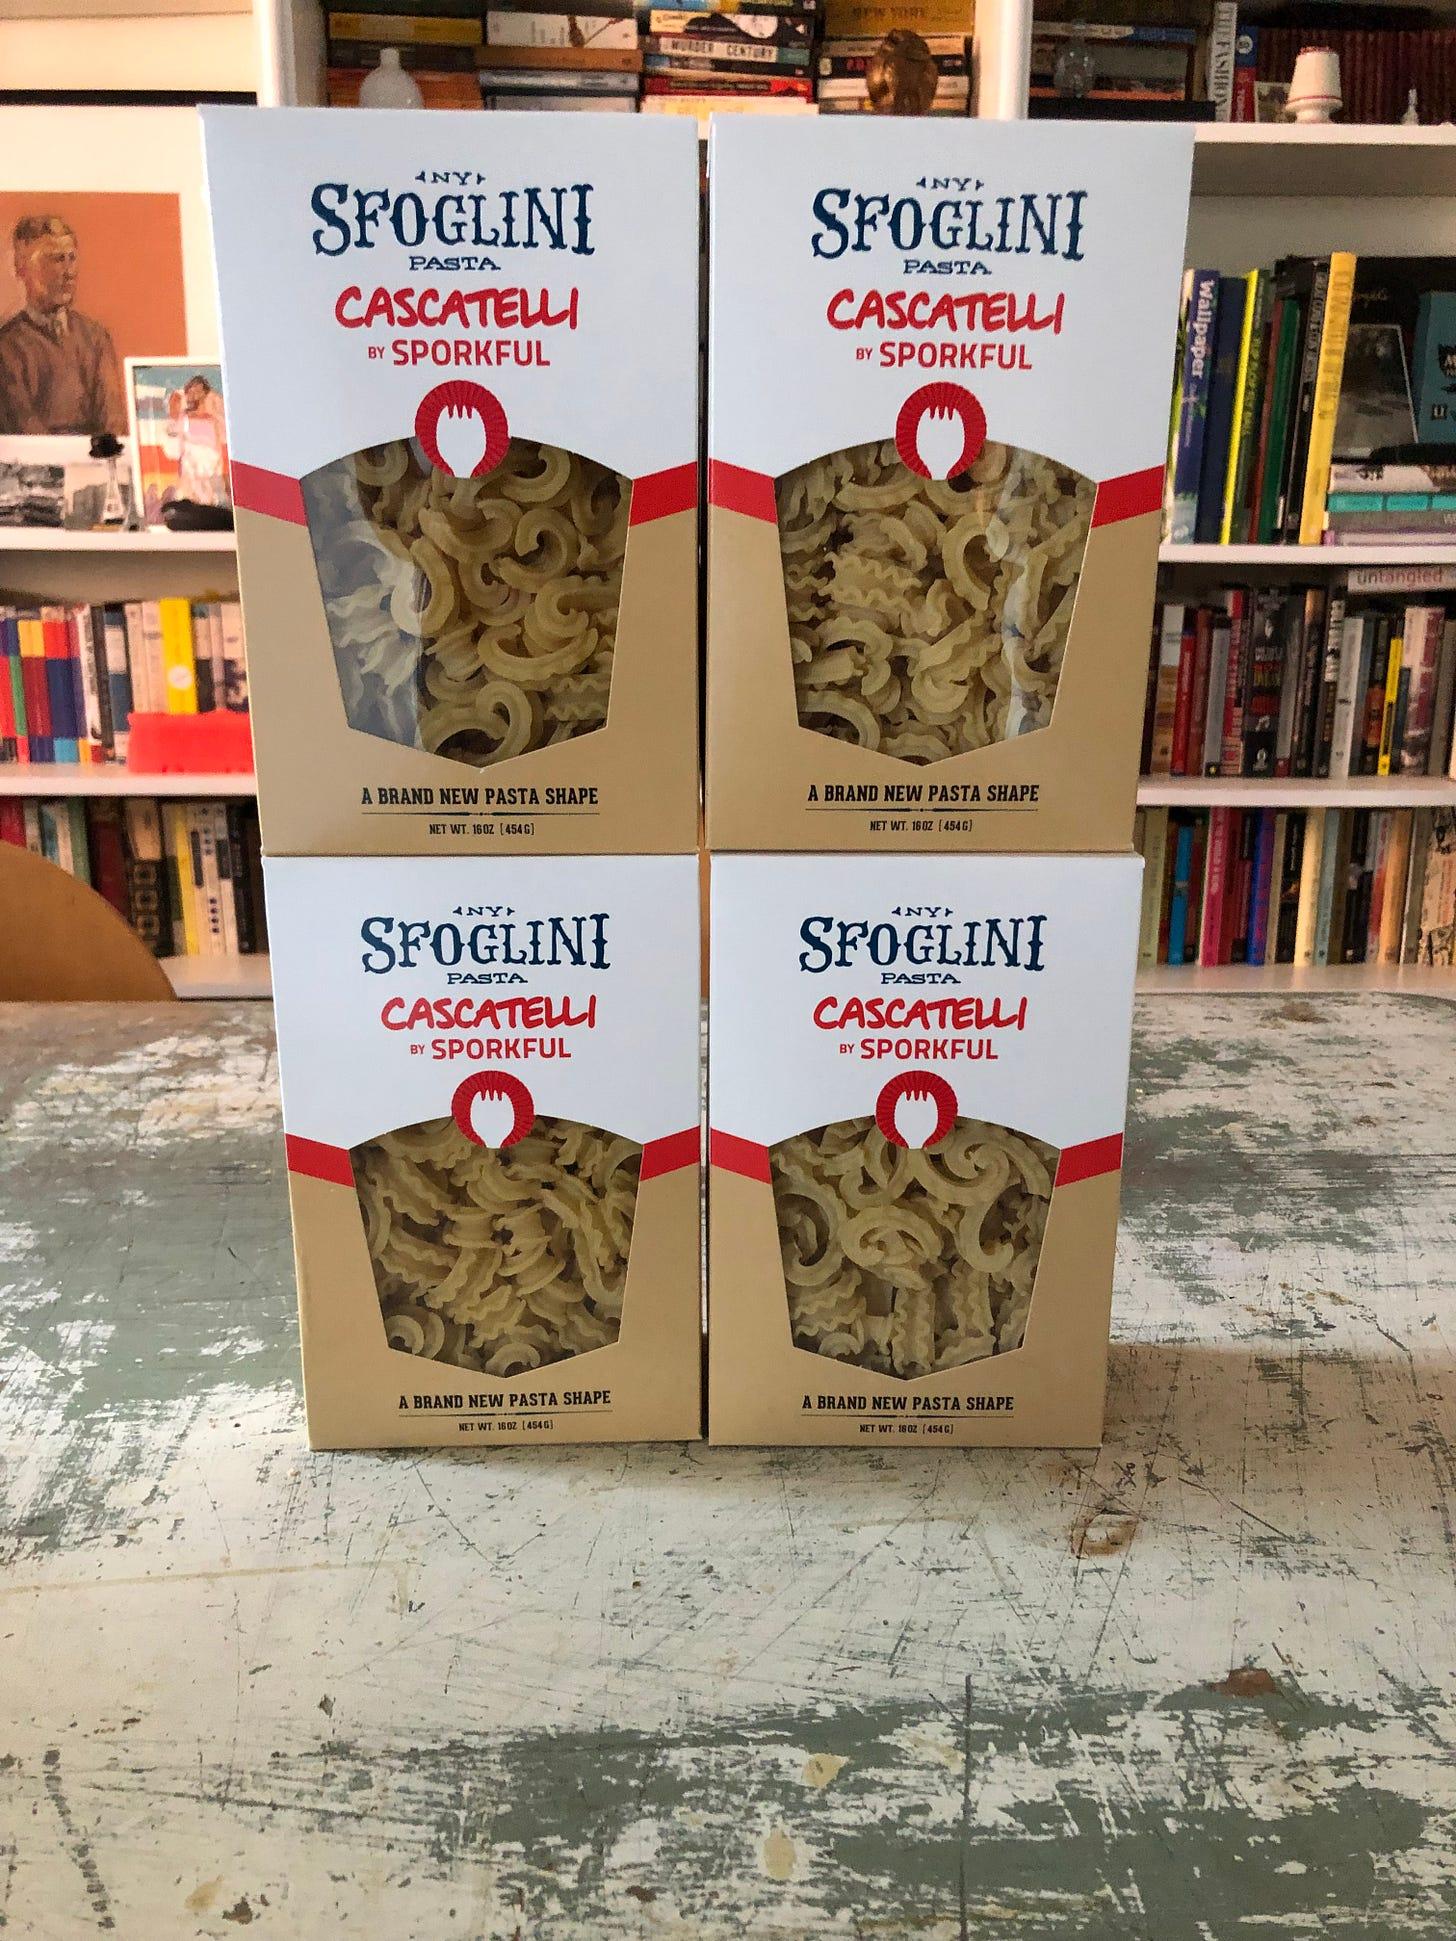 Four boxes of pasta. The boxes read Sfoglini Pasta. Cascatelli by Sporkful. A brand new pasta shape.